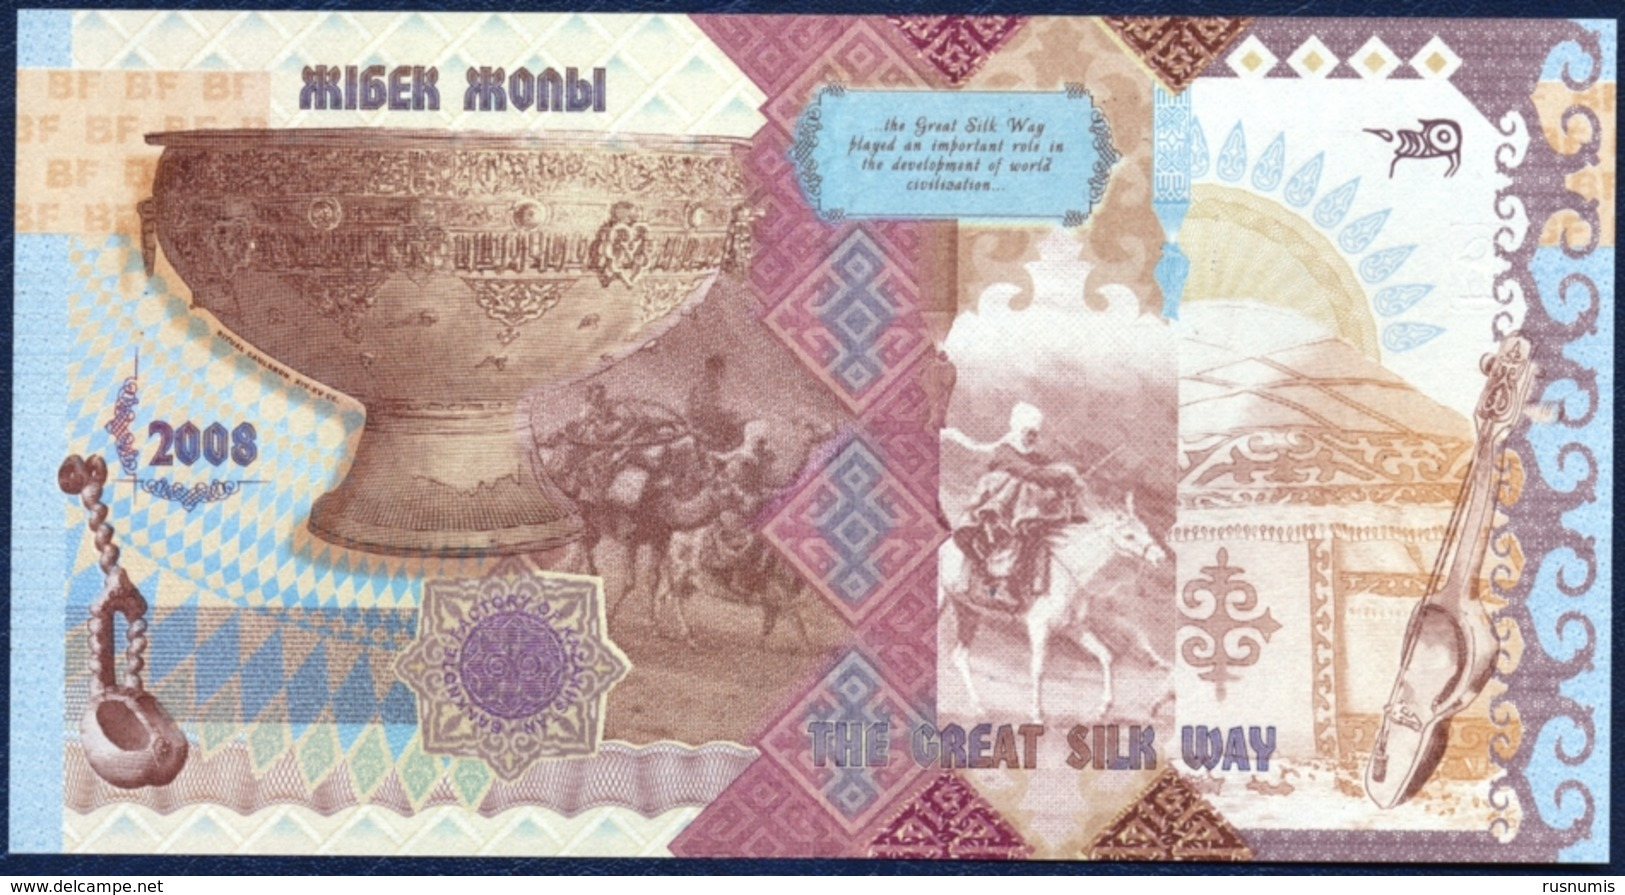 KAZAKHSTAN GOZNAK PRINTER RUSSIA TEST NOTE SILK WAY 2008 UNC - Billets